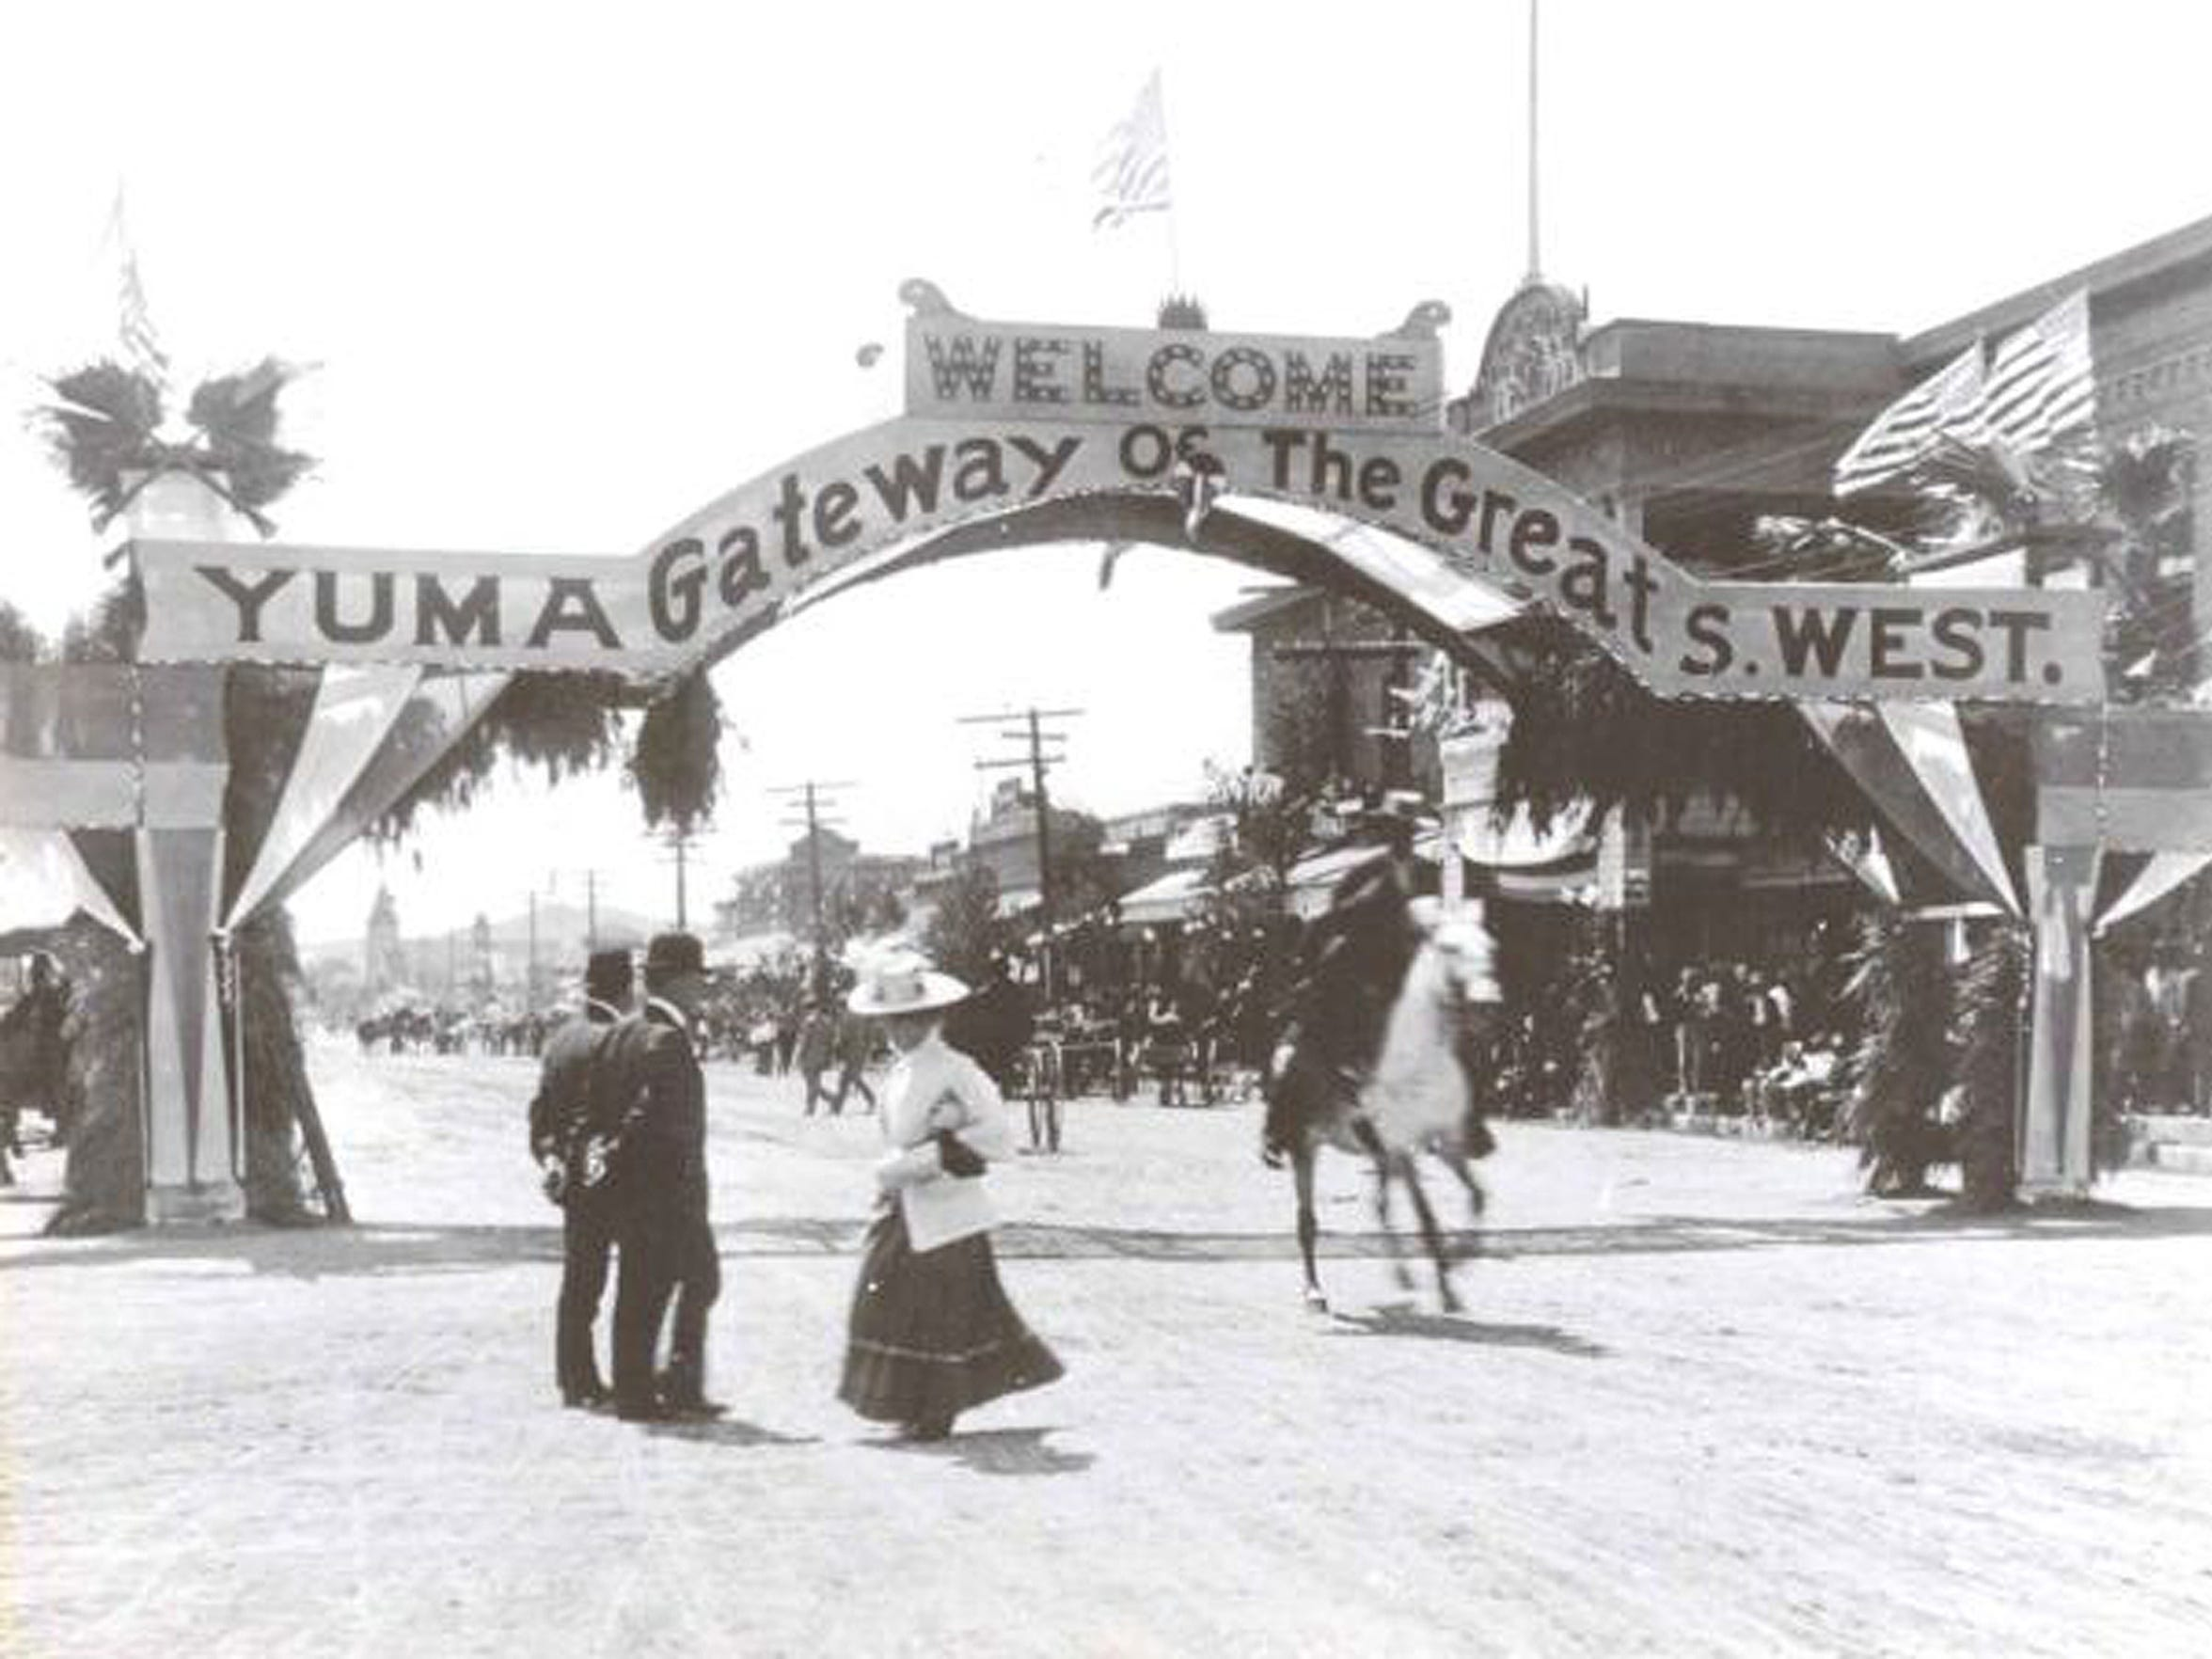 Main Street Yuma circa 1800s.  Credit: Yuma Crossing